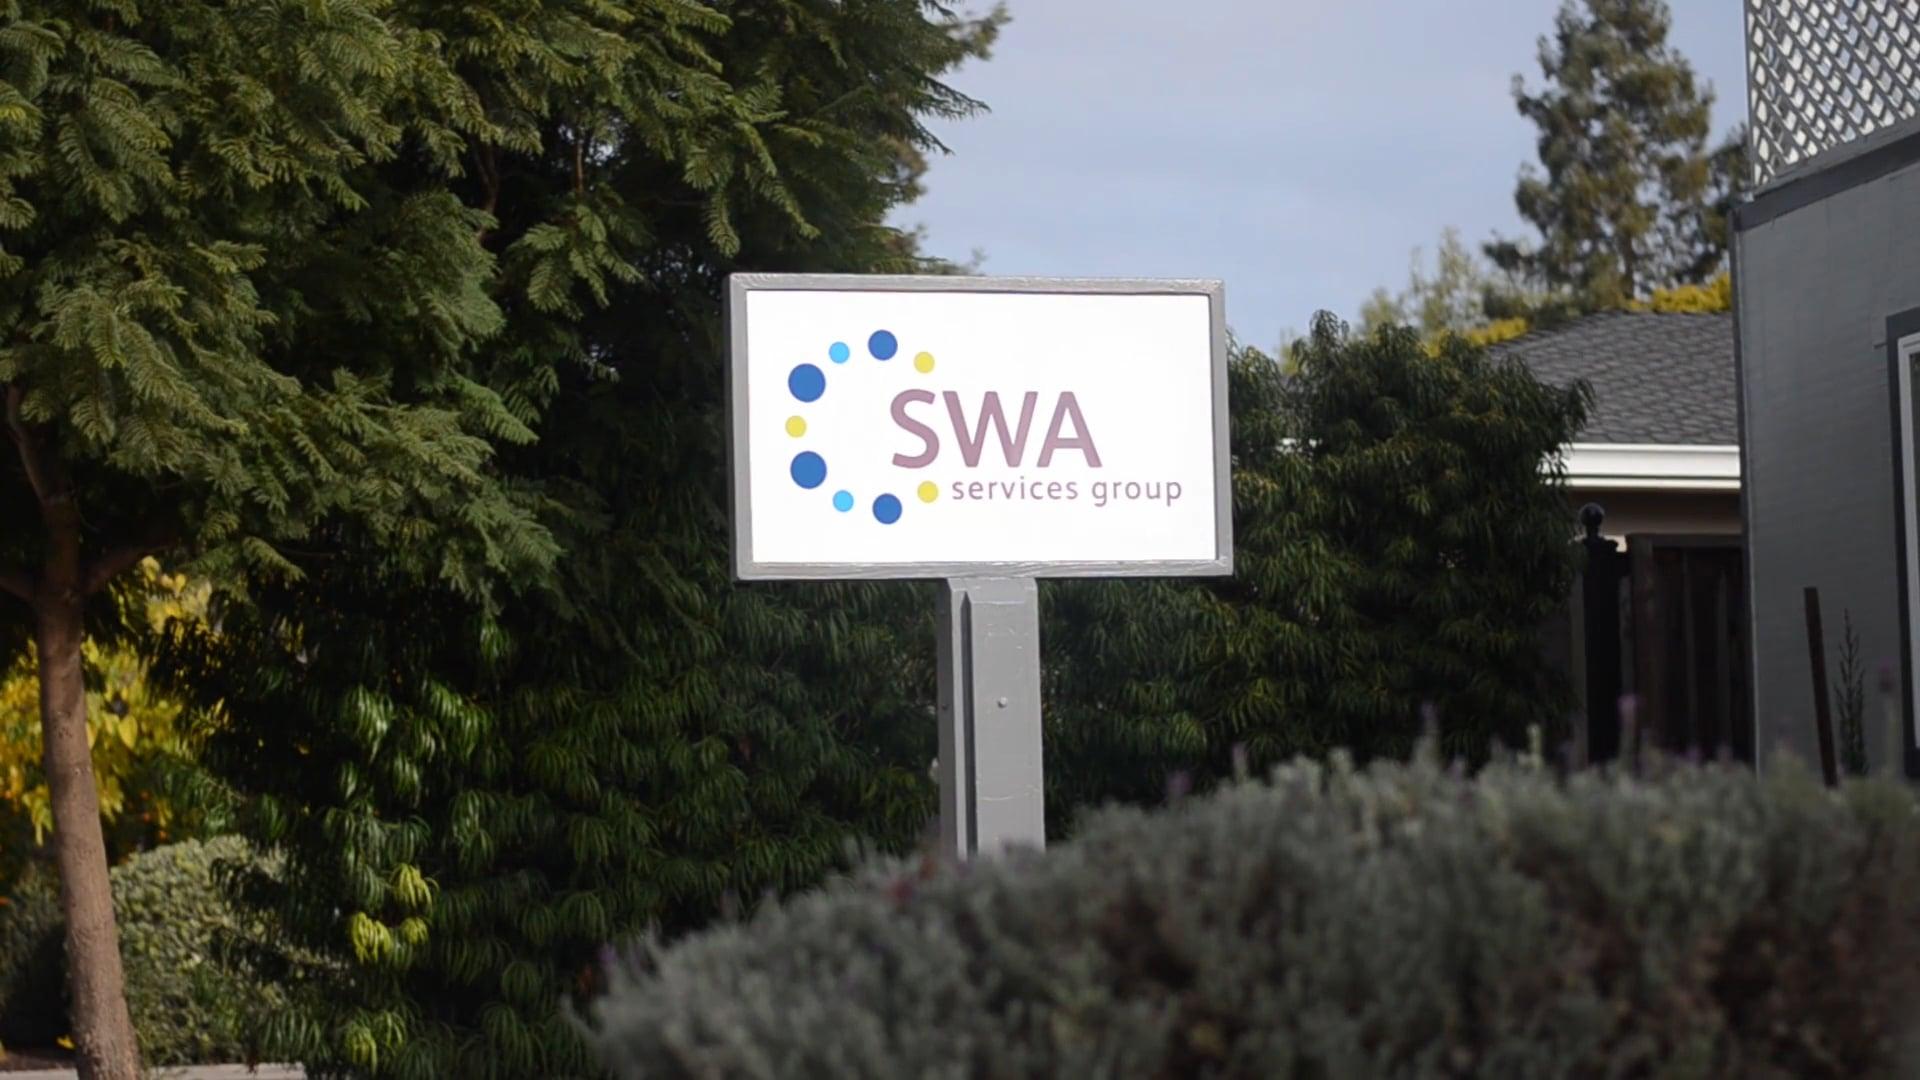 About SWA